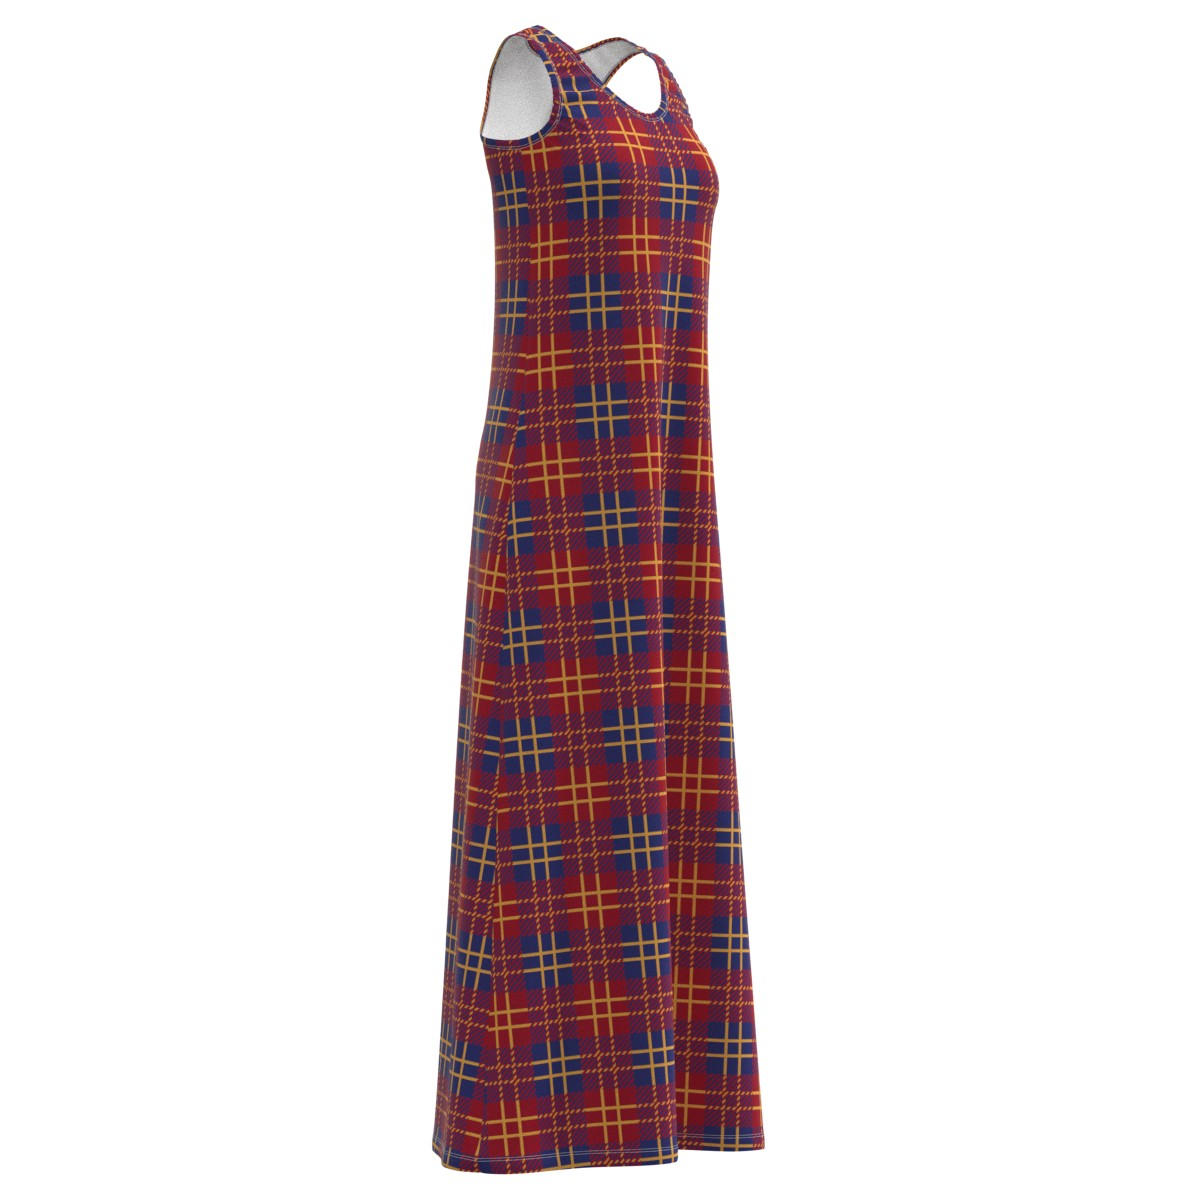 EightyThreeXYZ Allure Red Majestic bluee Plaid Long Long Long Maxi Dress Size XS-5XL Plus 960a45